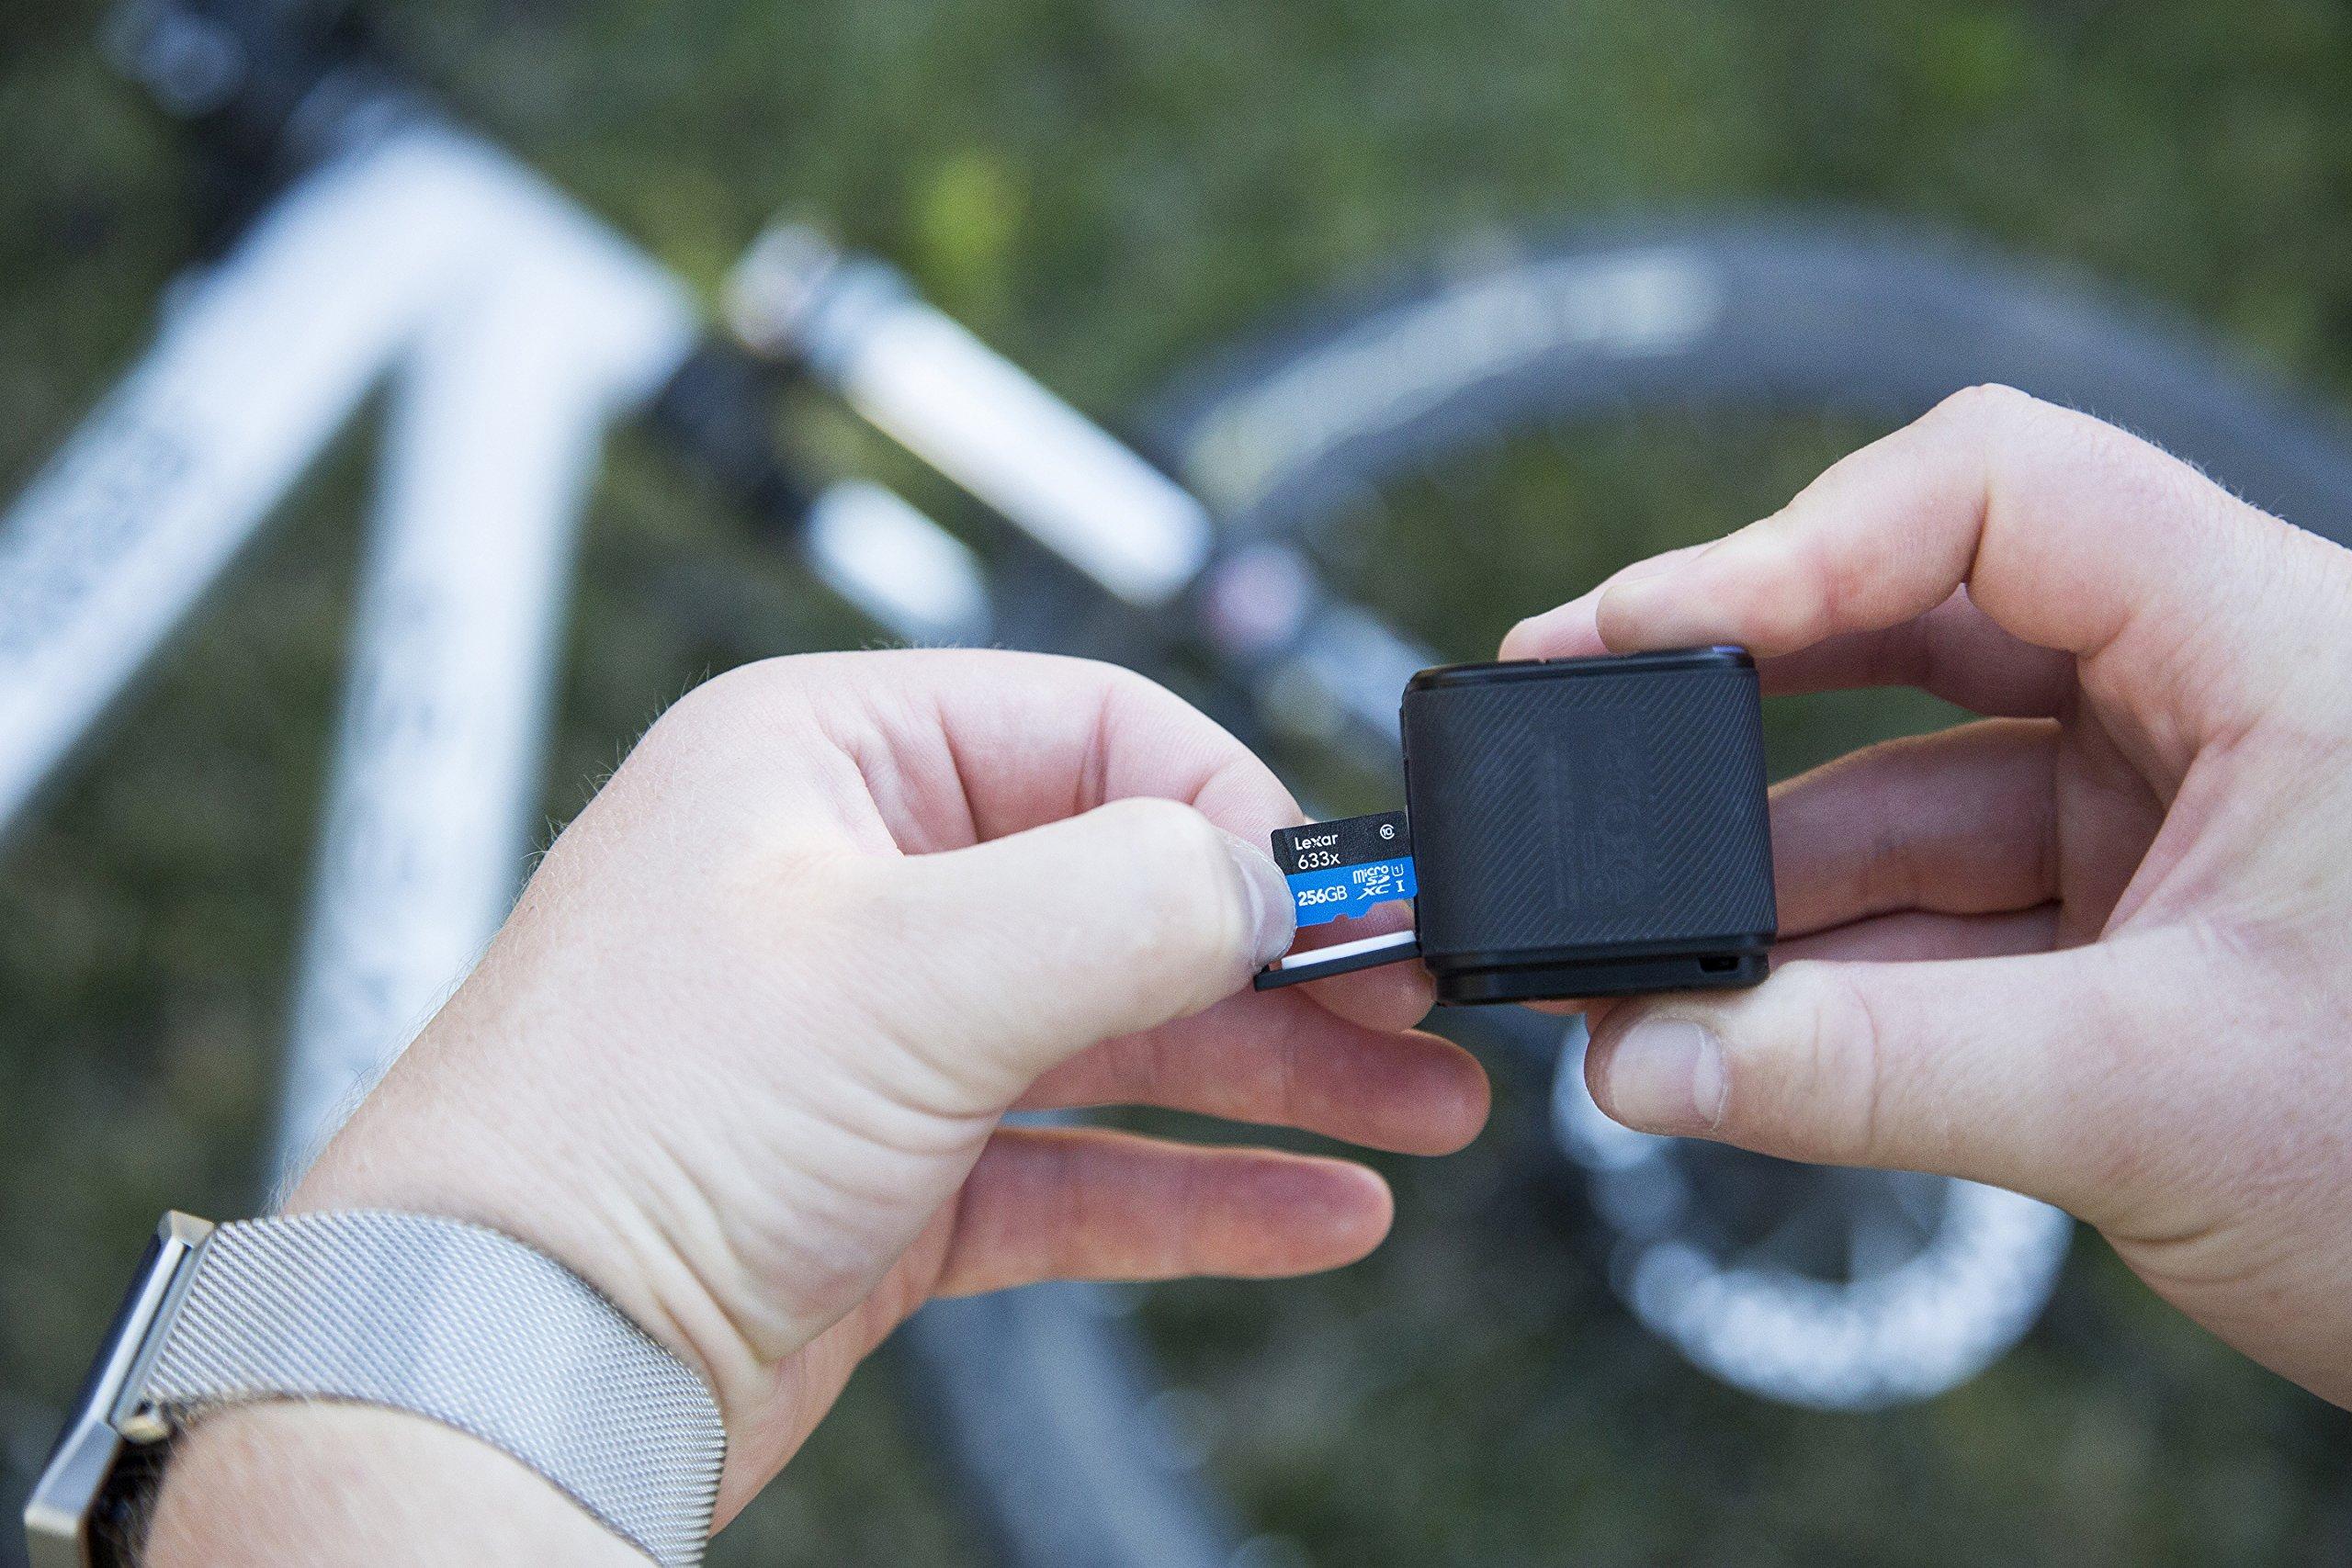 Lexar High-Performance microSDXC 633x 256GB UHS-I Card w/SD Adapter - LSDMI256BBNL633A by Lexar (Image #6)